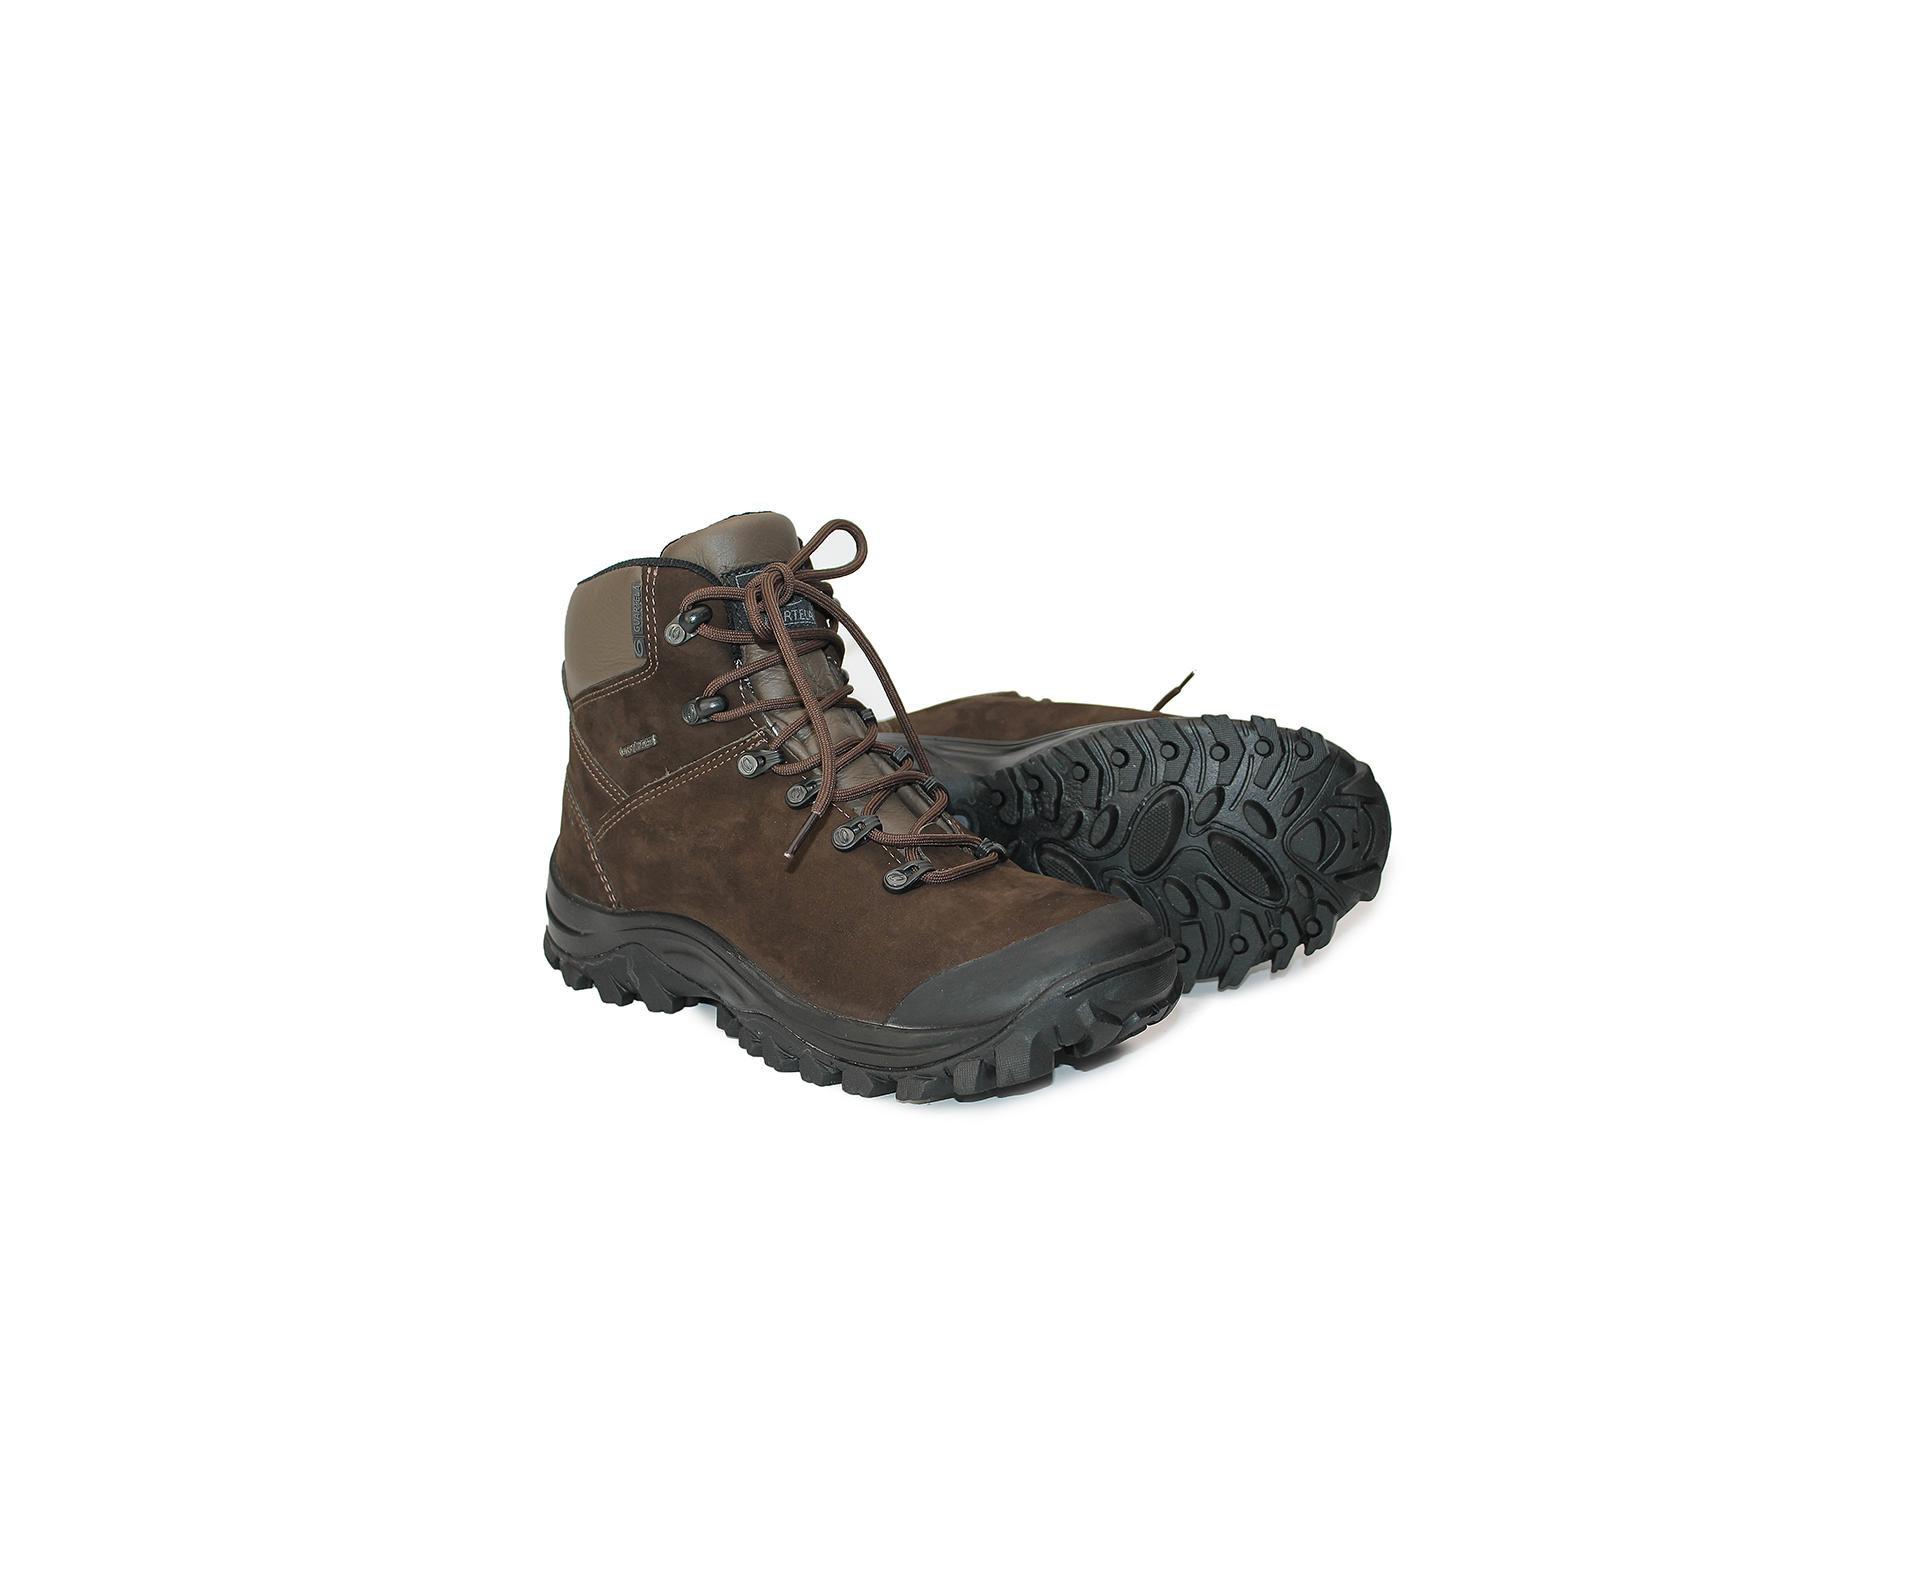 Bota Guartelá Montana Mid Dry Marrom Impermeável - 39